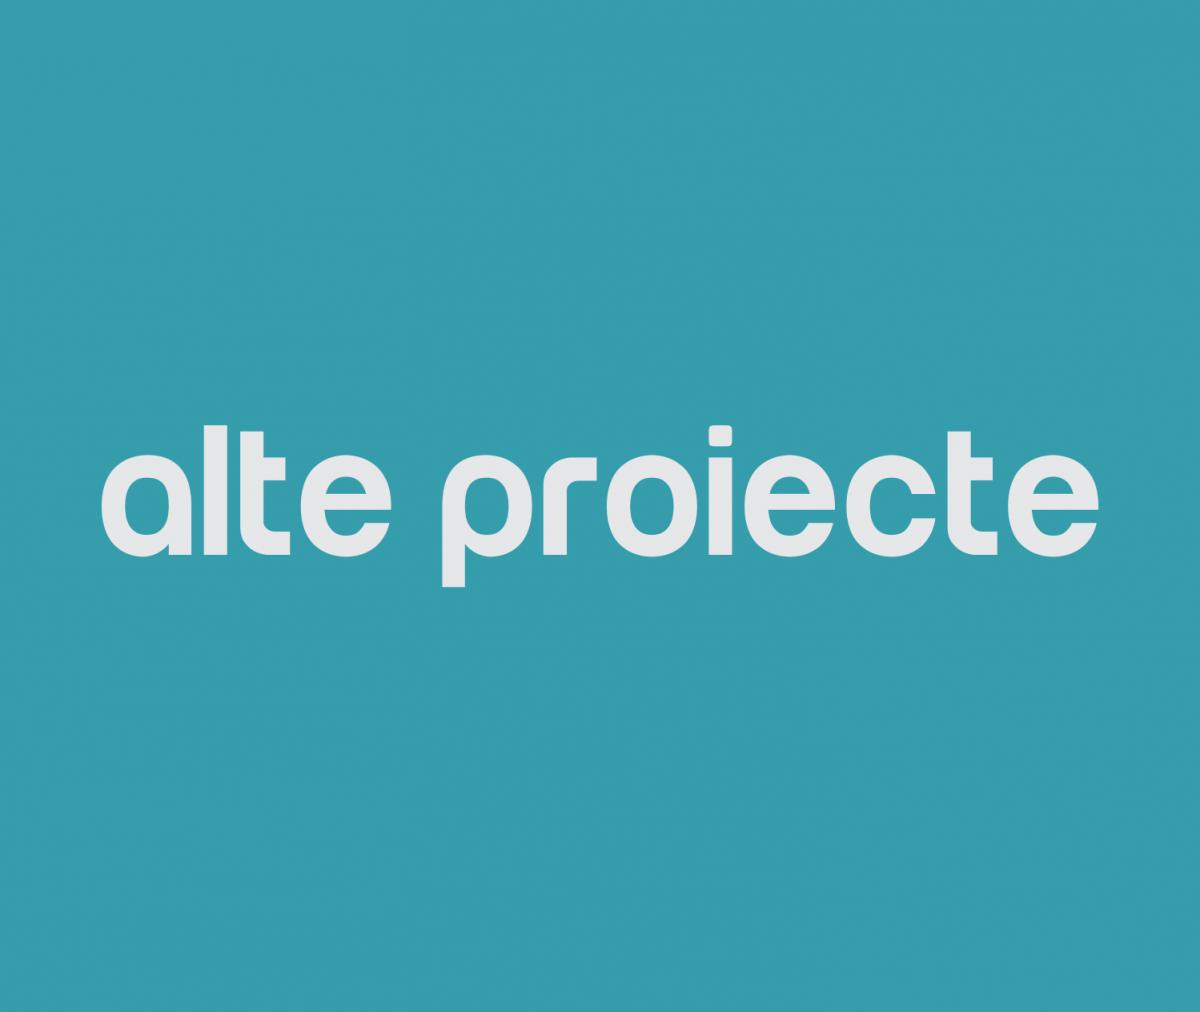 alte-proeicte-IBERAMI-1200x1012.png